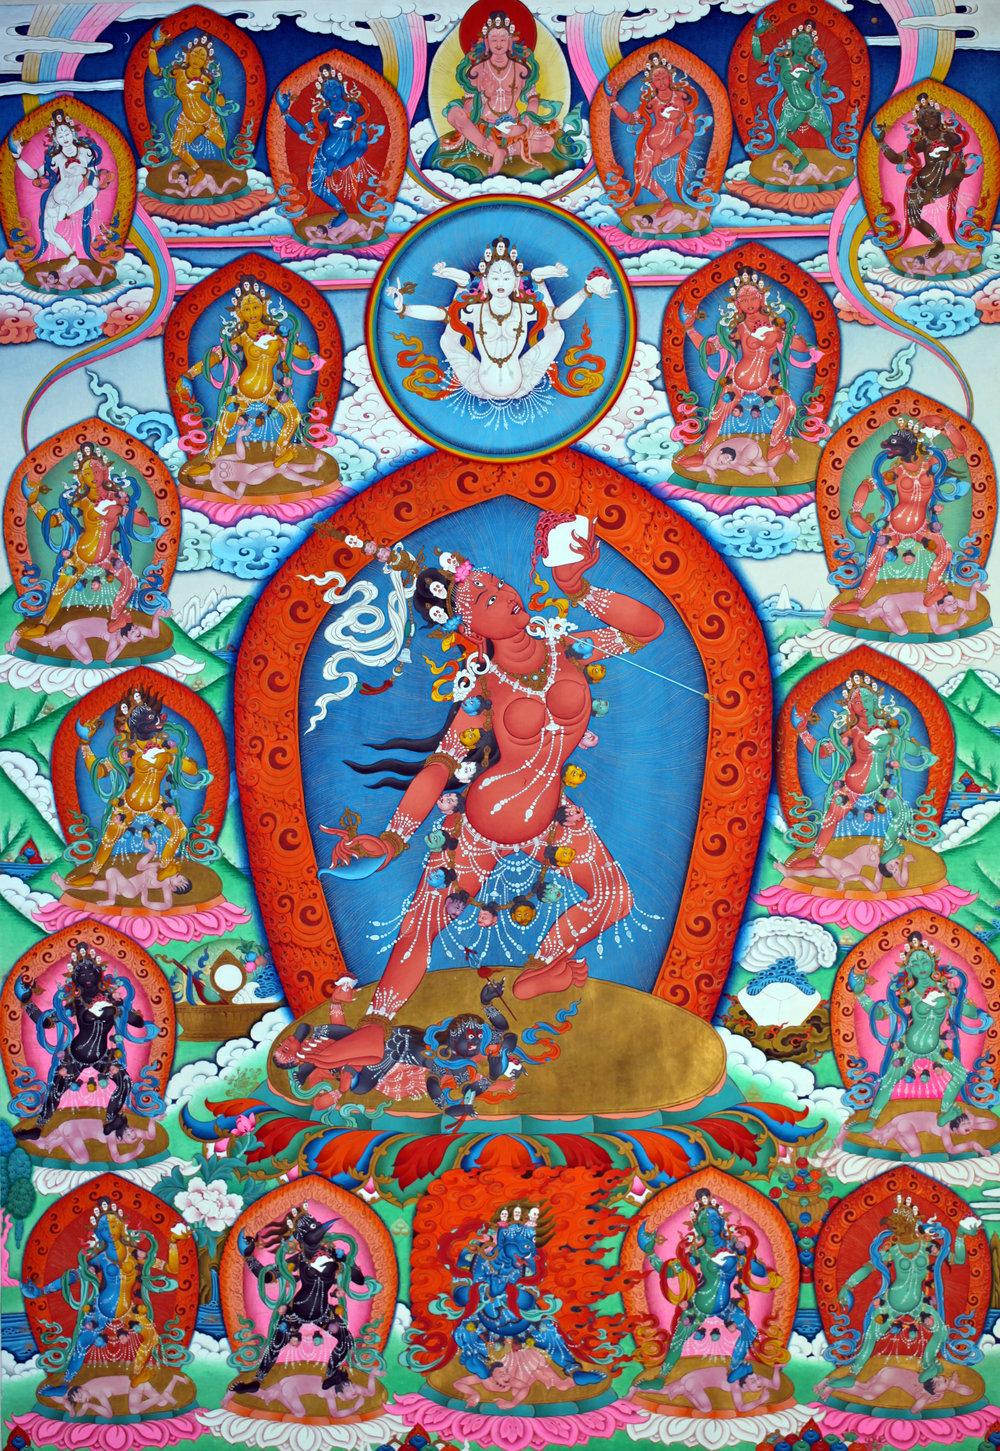 Dechen Choekhor's Vajrayogini thangka